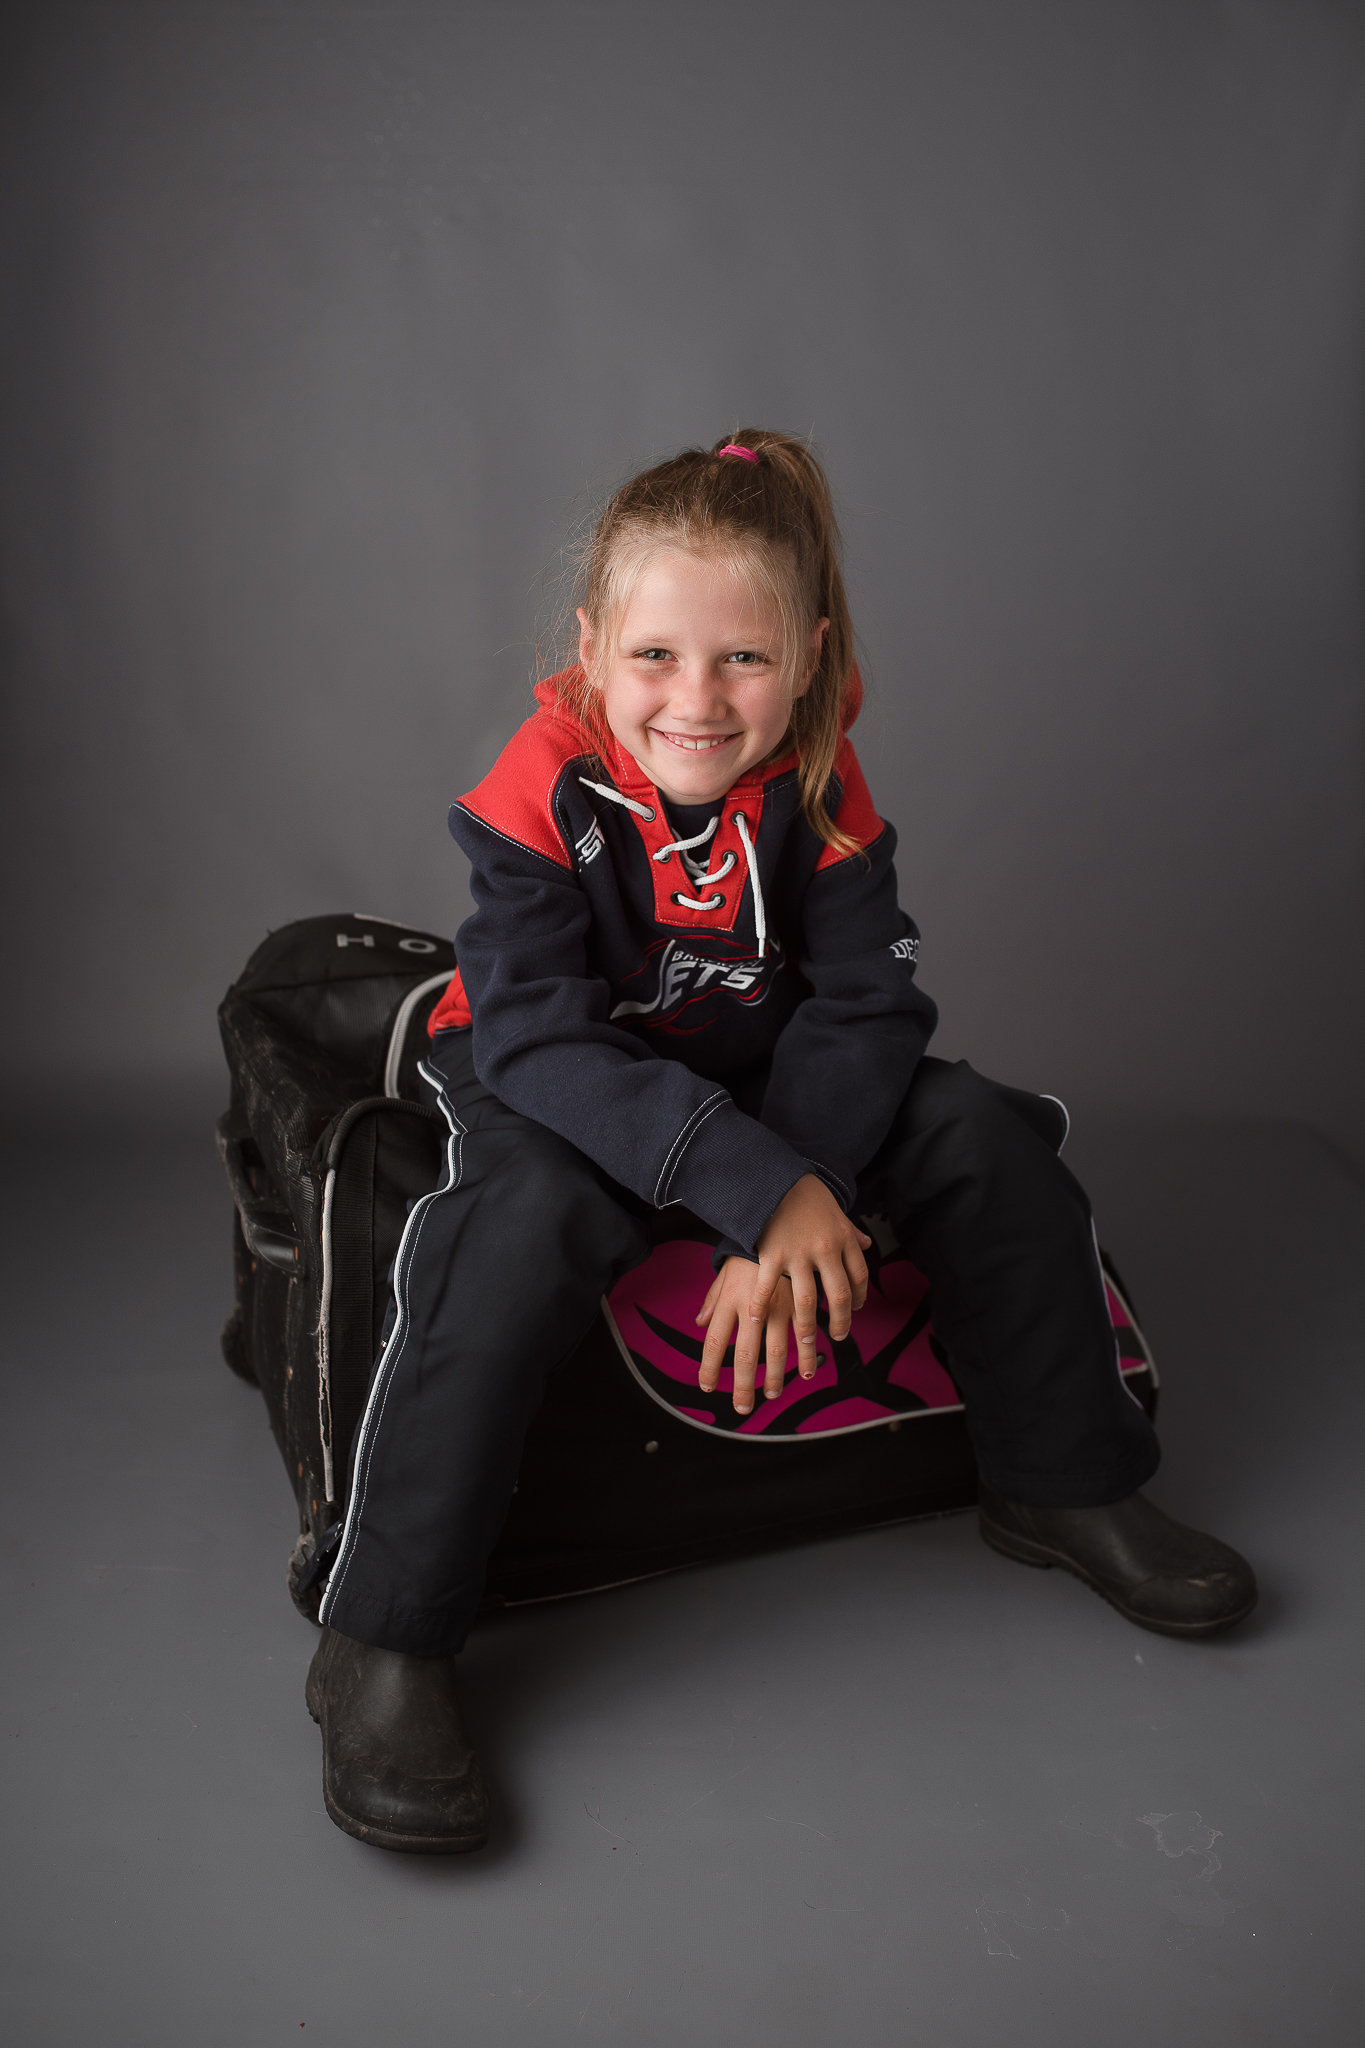 Naomi Lucienne Peterborough Photography Portrait Photography Children Photography Family Photography-15.jpg